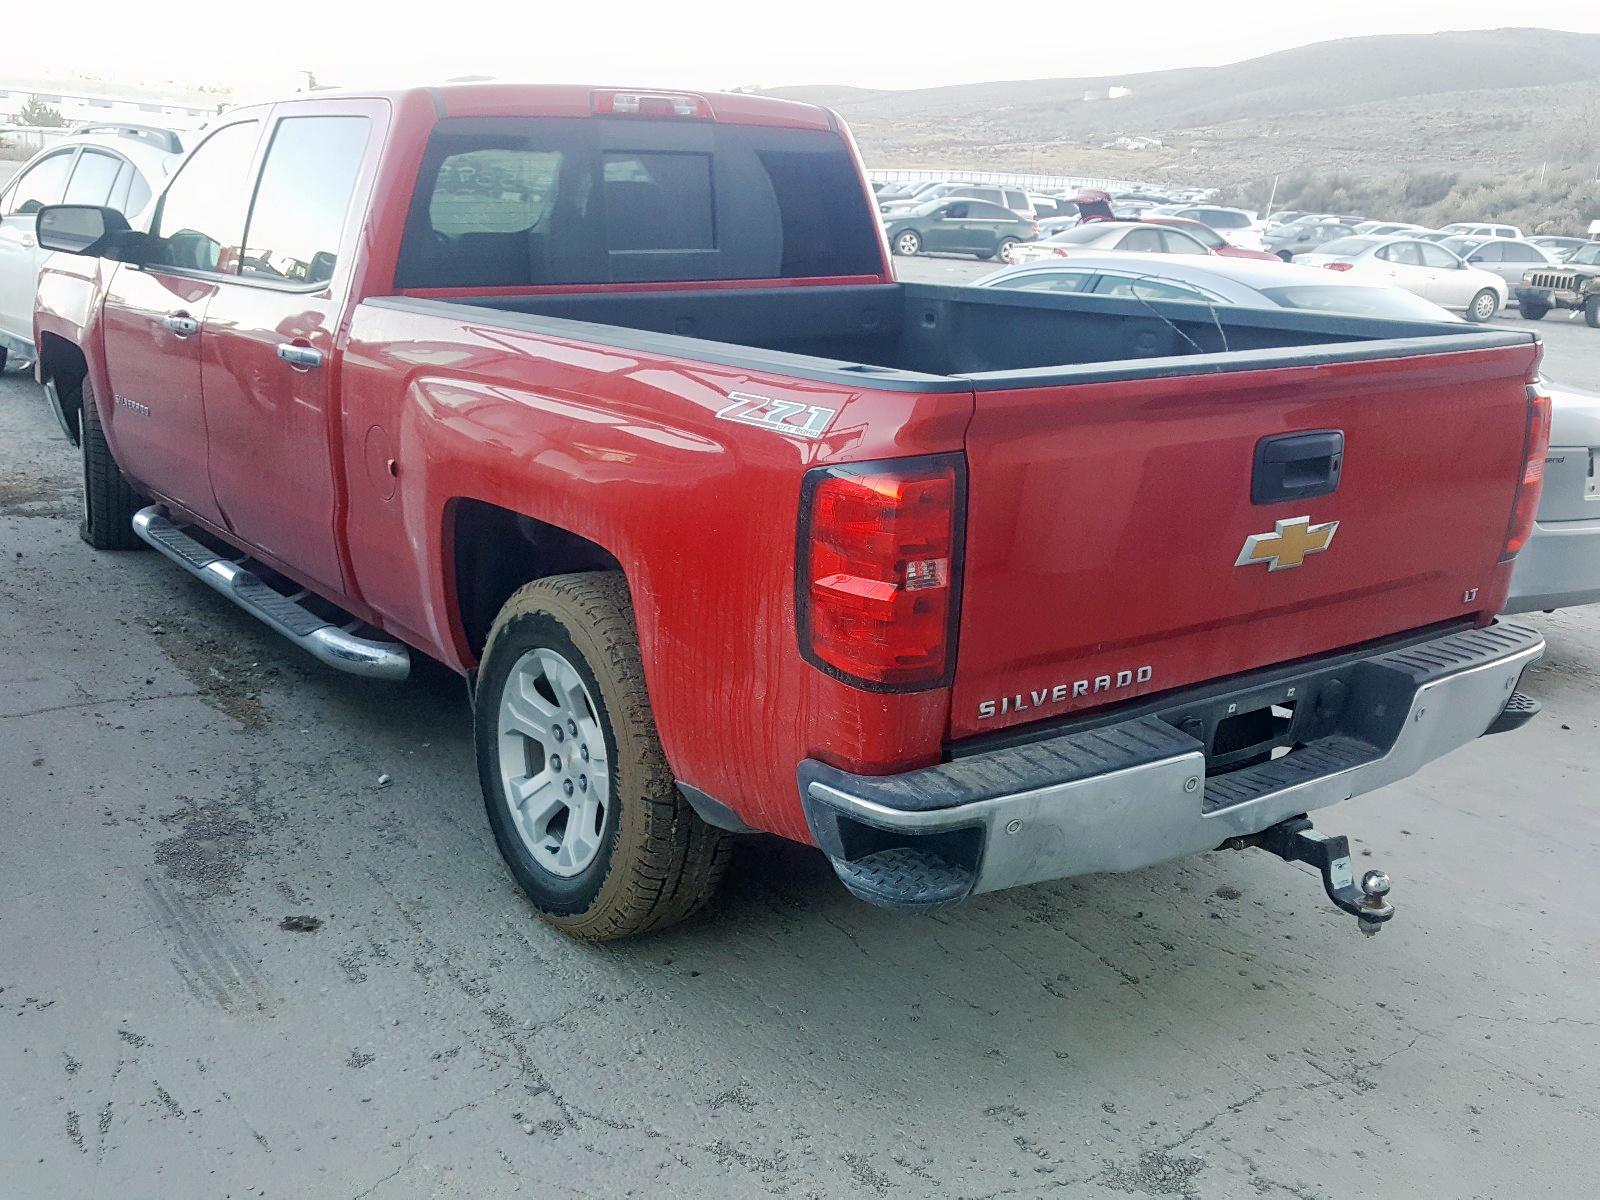 3GCUKREC0EG546934 - 2014 Chevrolet Silverado 5.3L [Angle] View